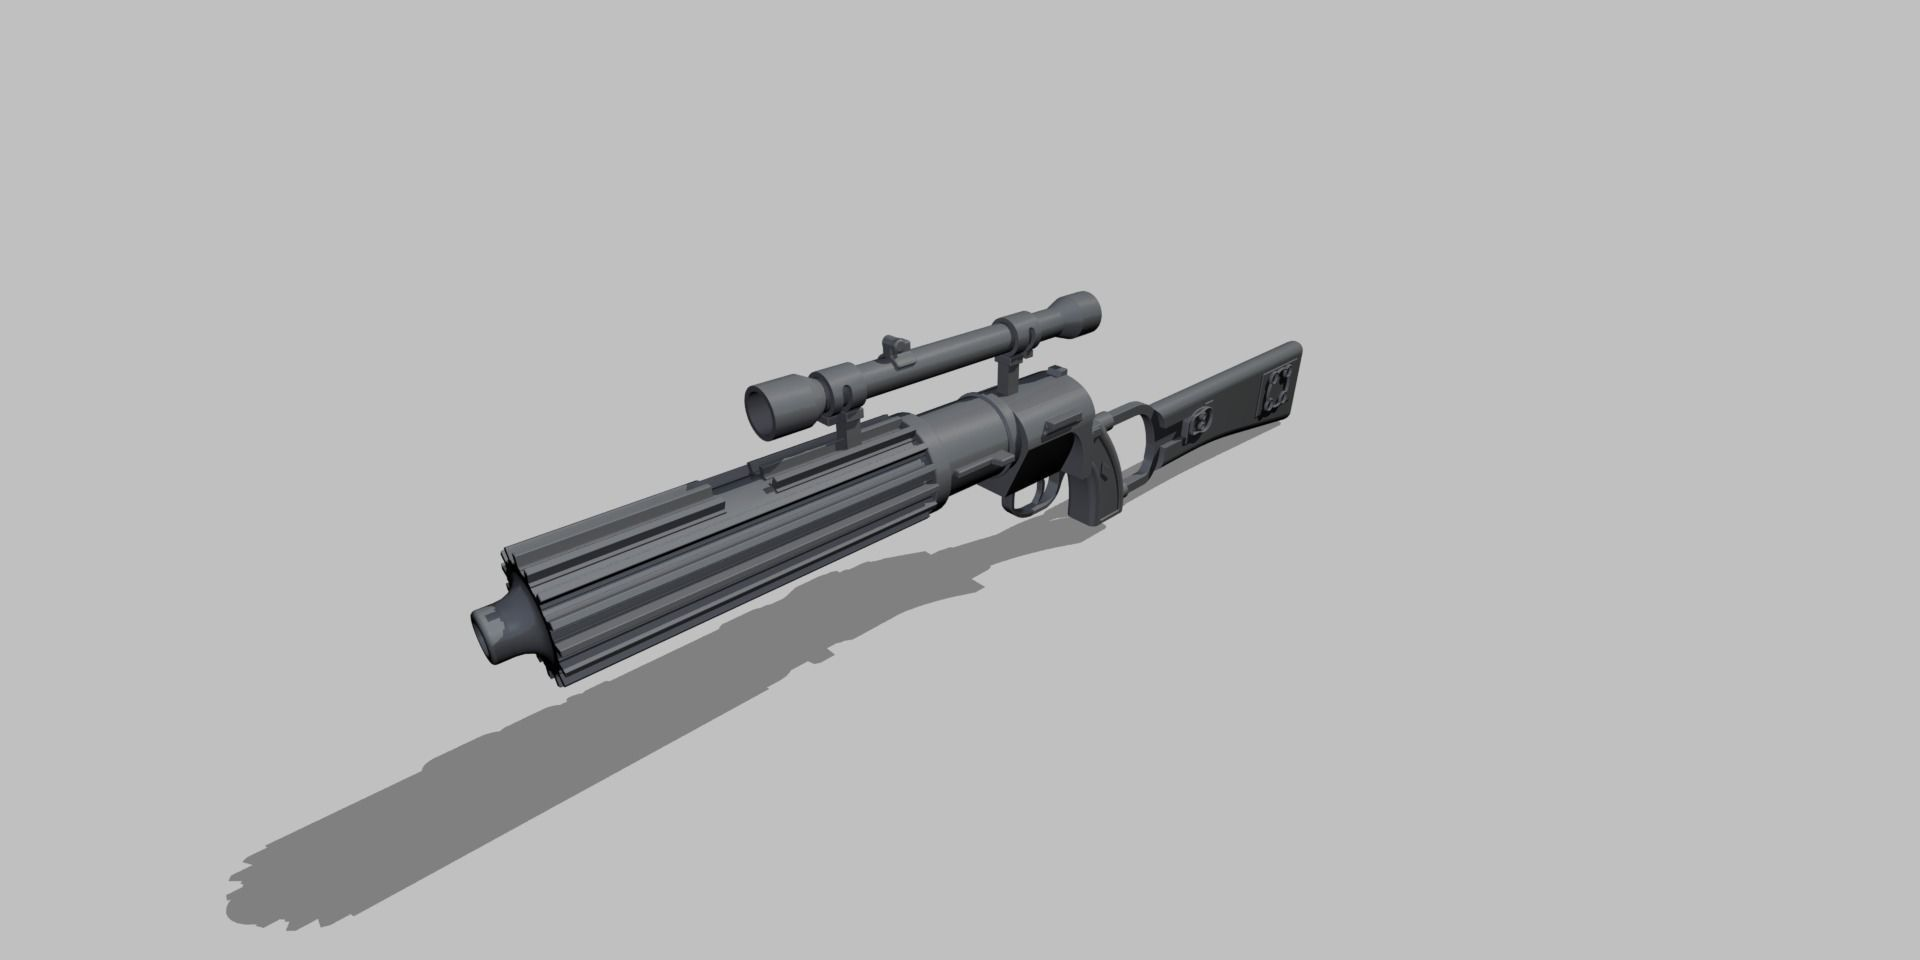 Star Wars Boba Fett Blaster Carabine EE-3